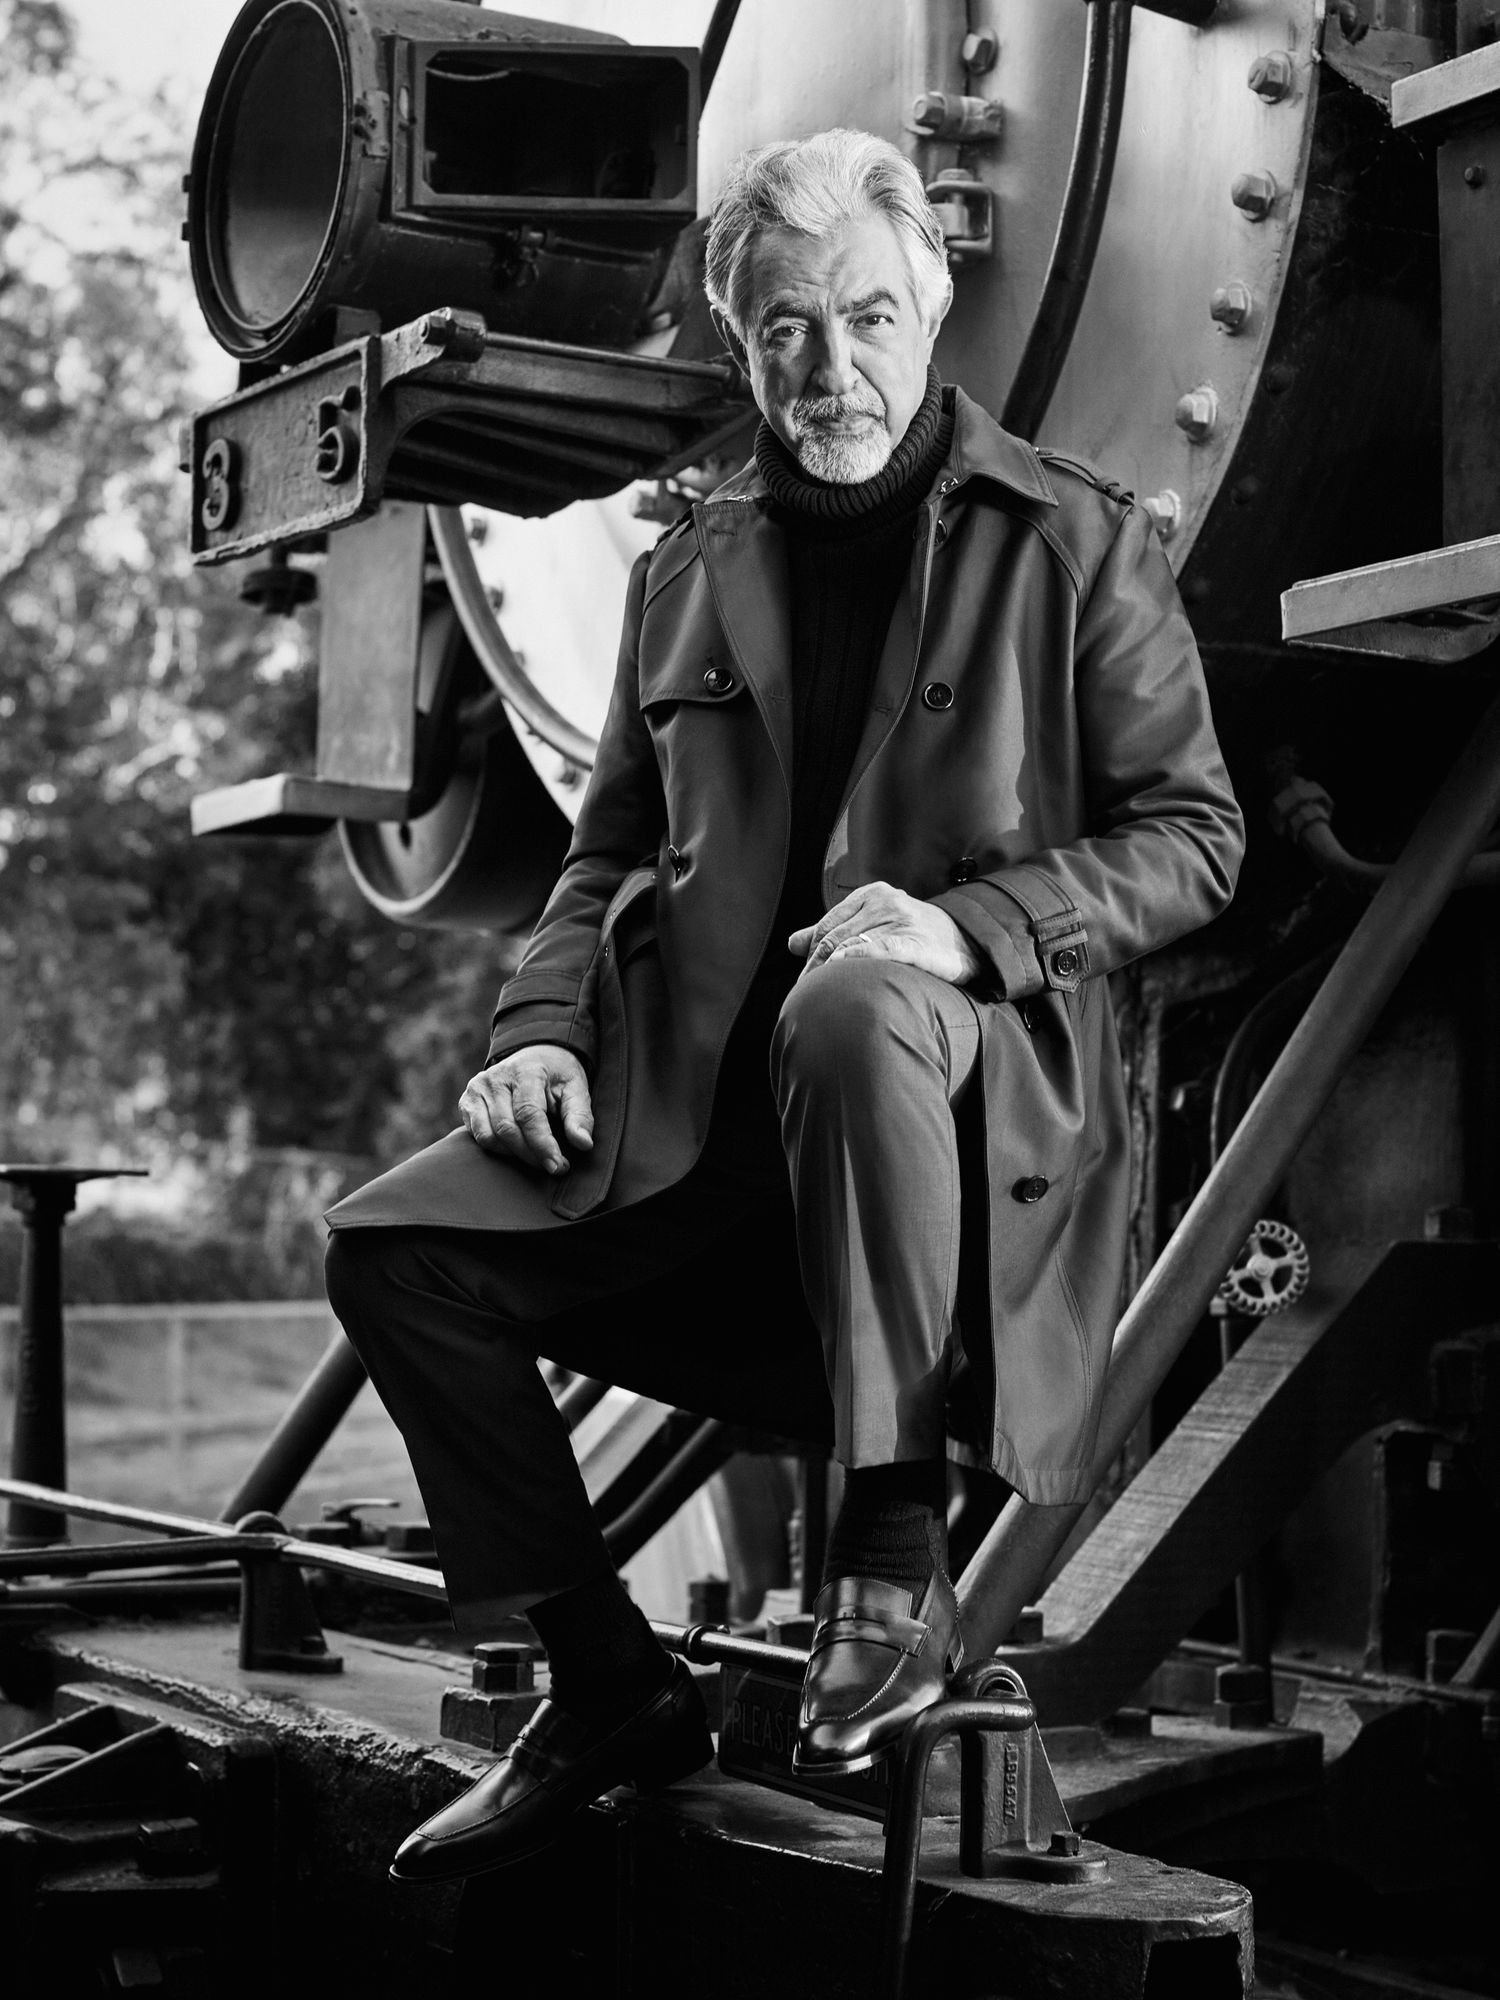 Joe Mantegna sitting in front of a vintage train locomotive.